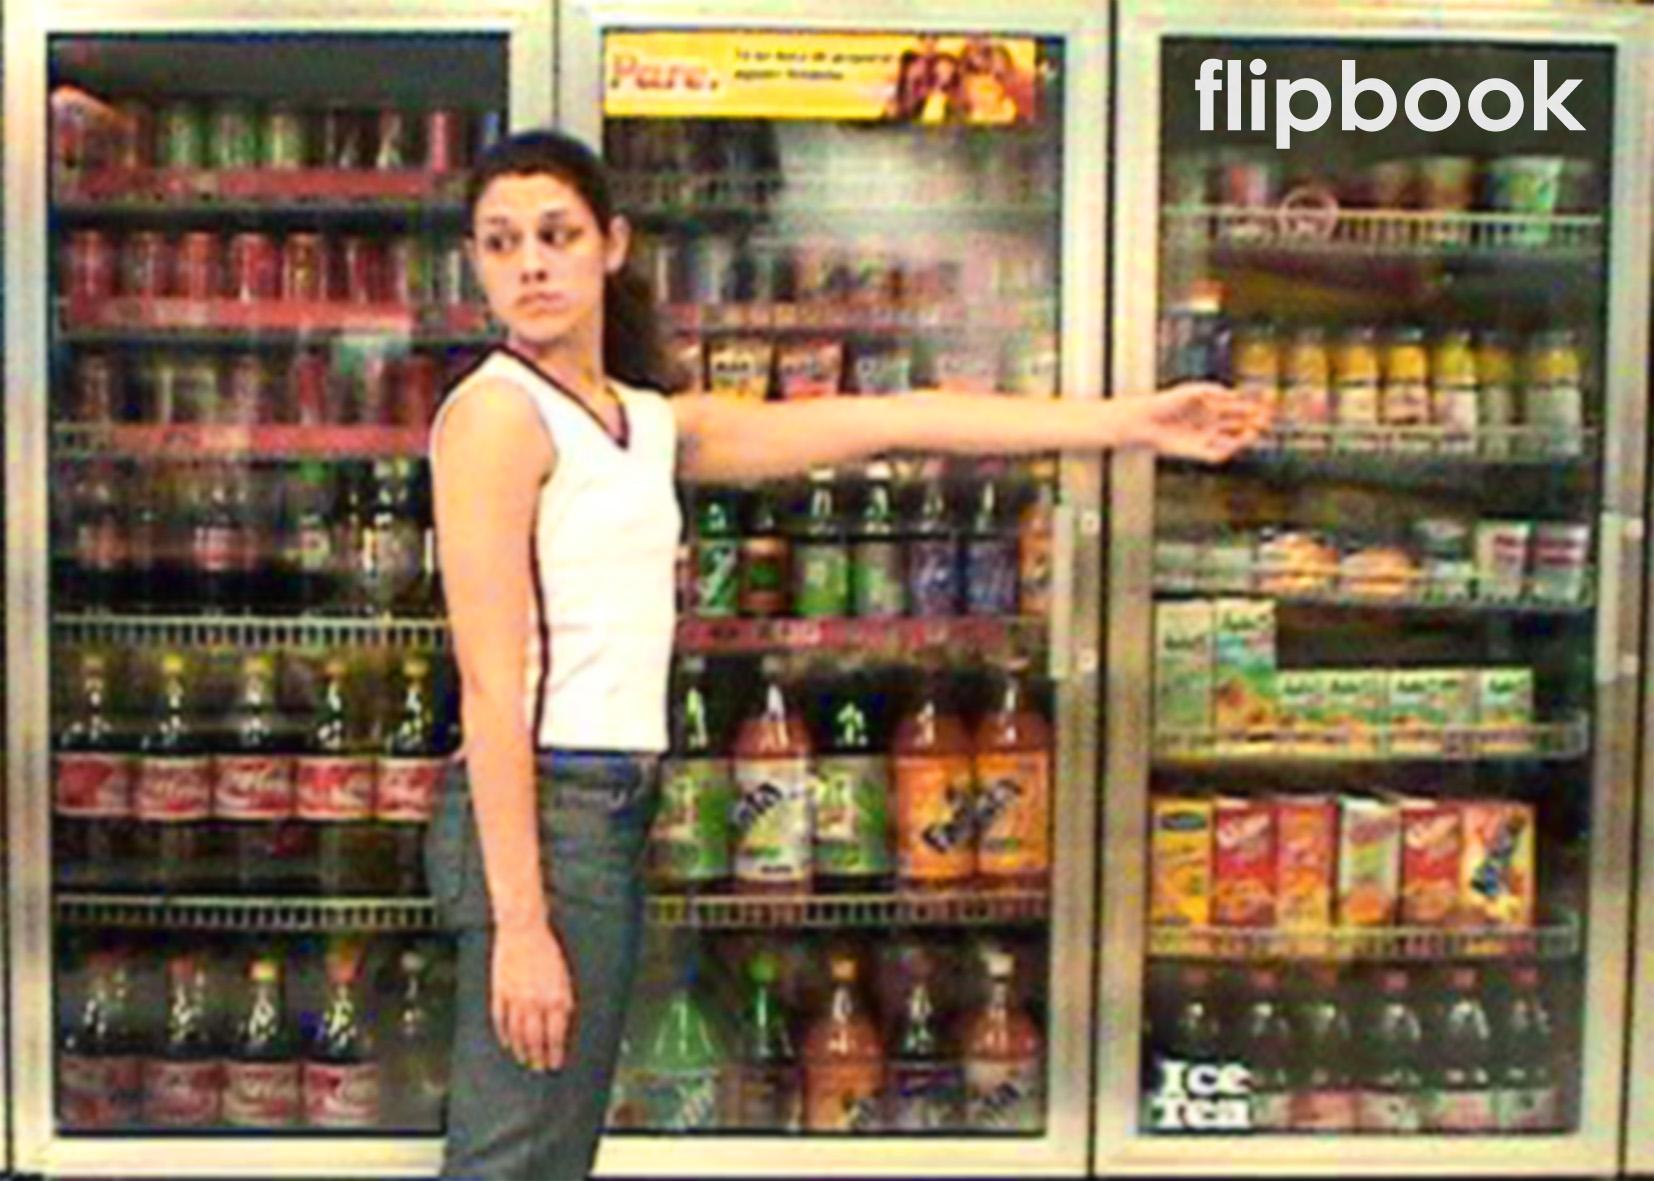 Flipbook (2004)